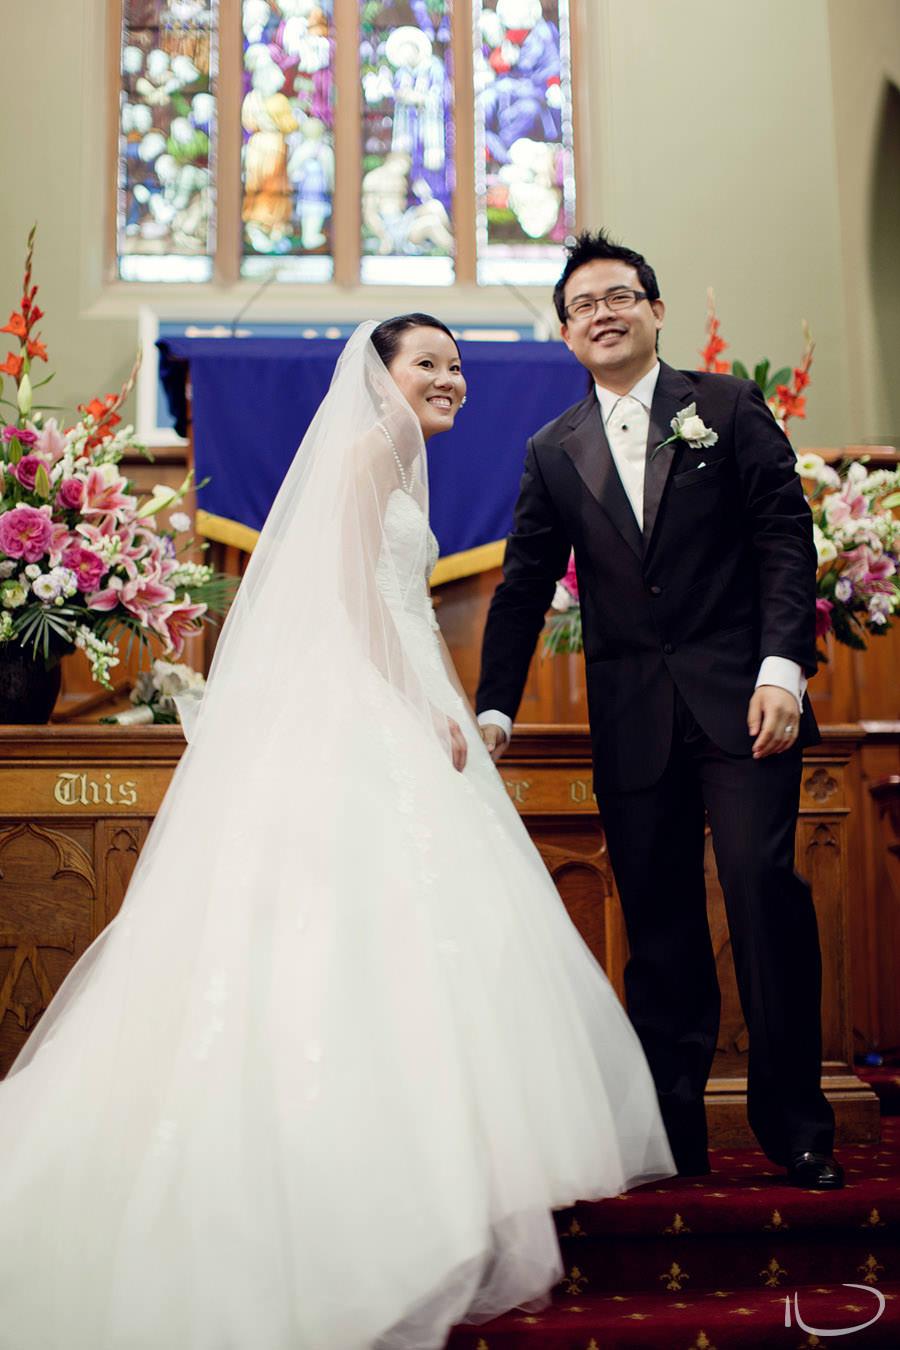 Chinese Presbyterian Church Wedding Photographer: Bride & Groom